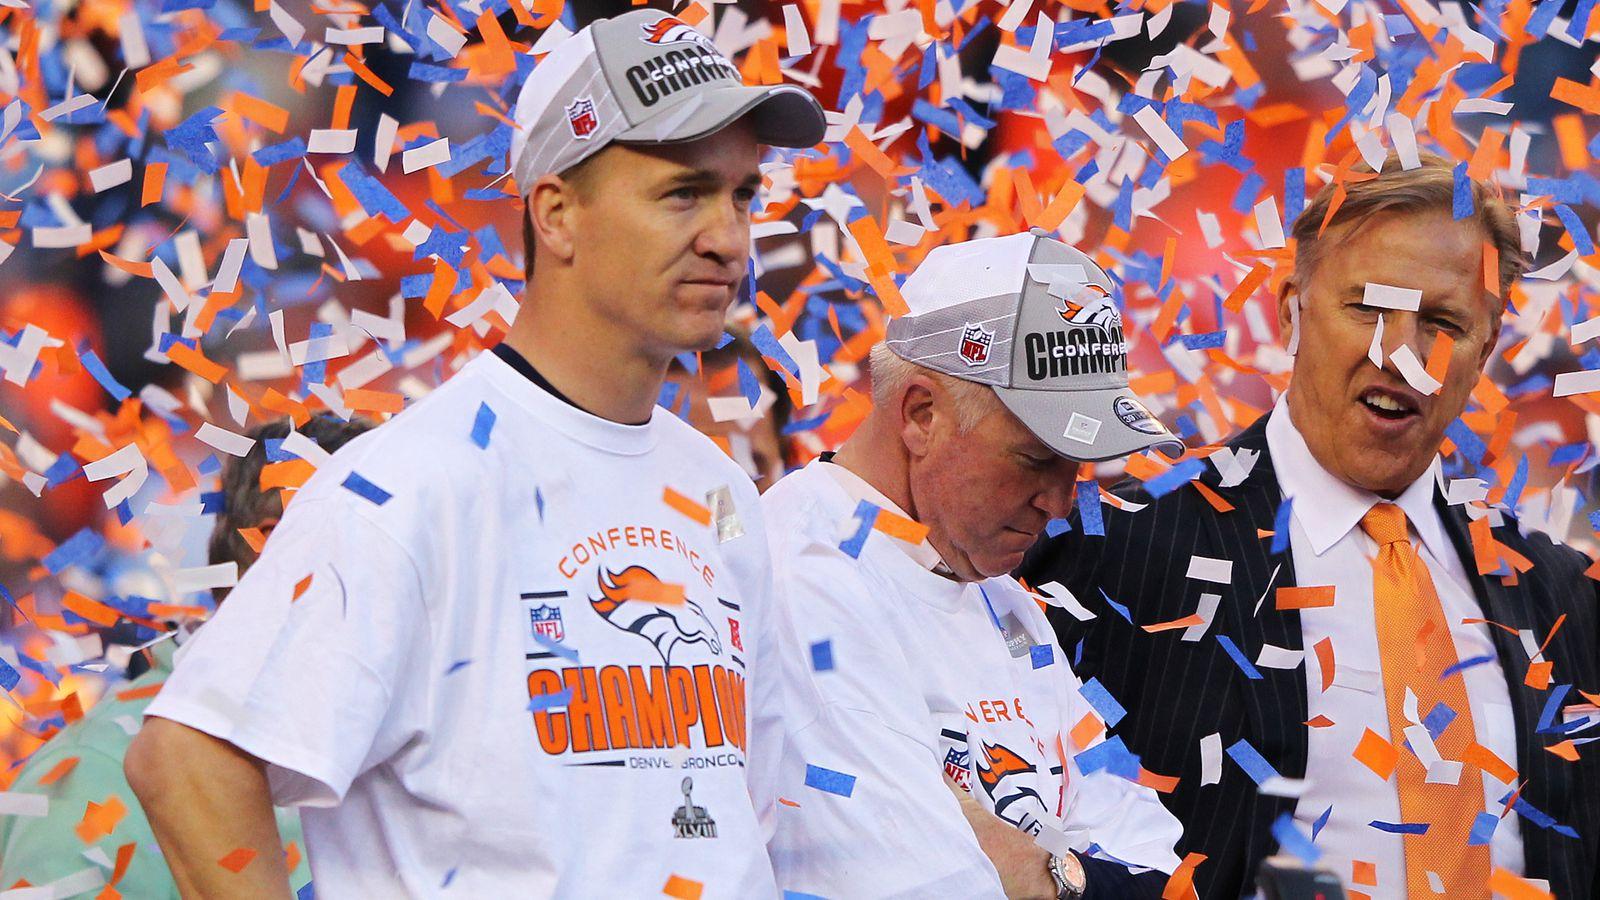 Peyton Manning的无情告别巡演继续进行